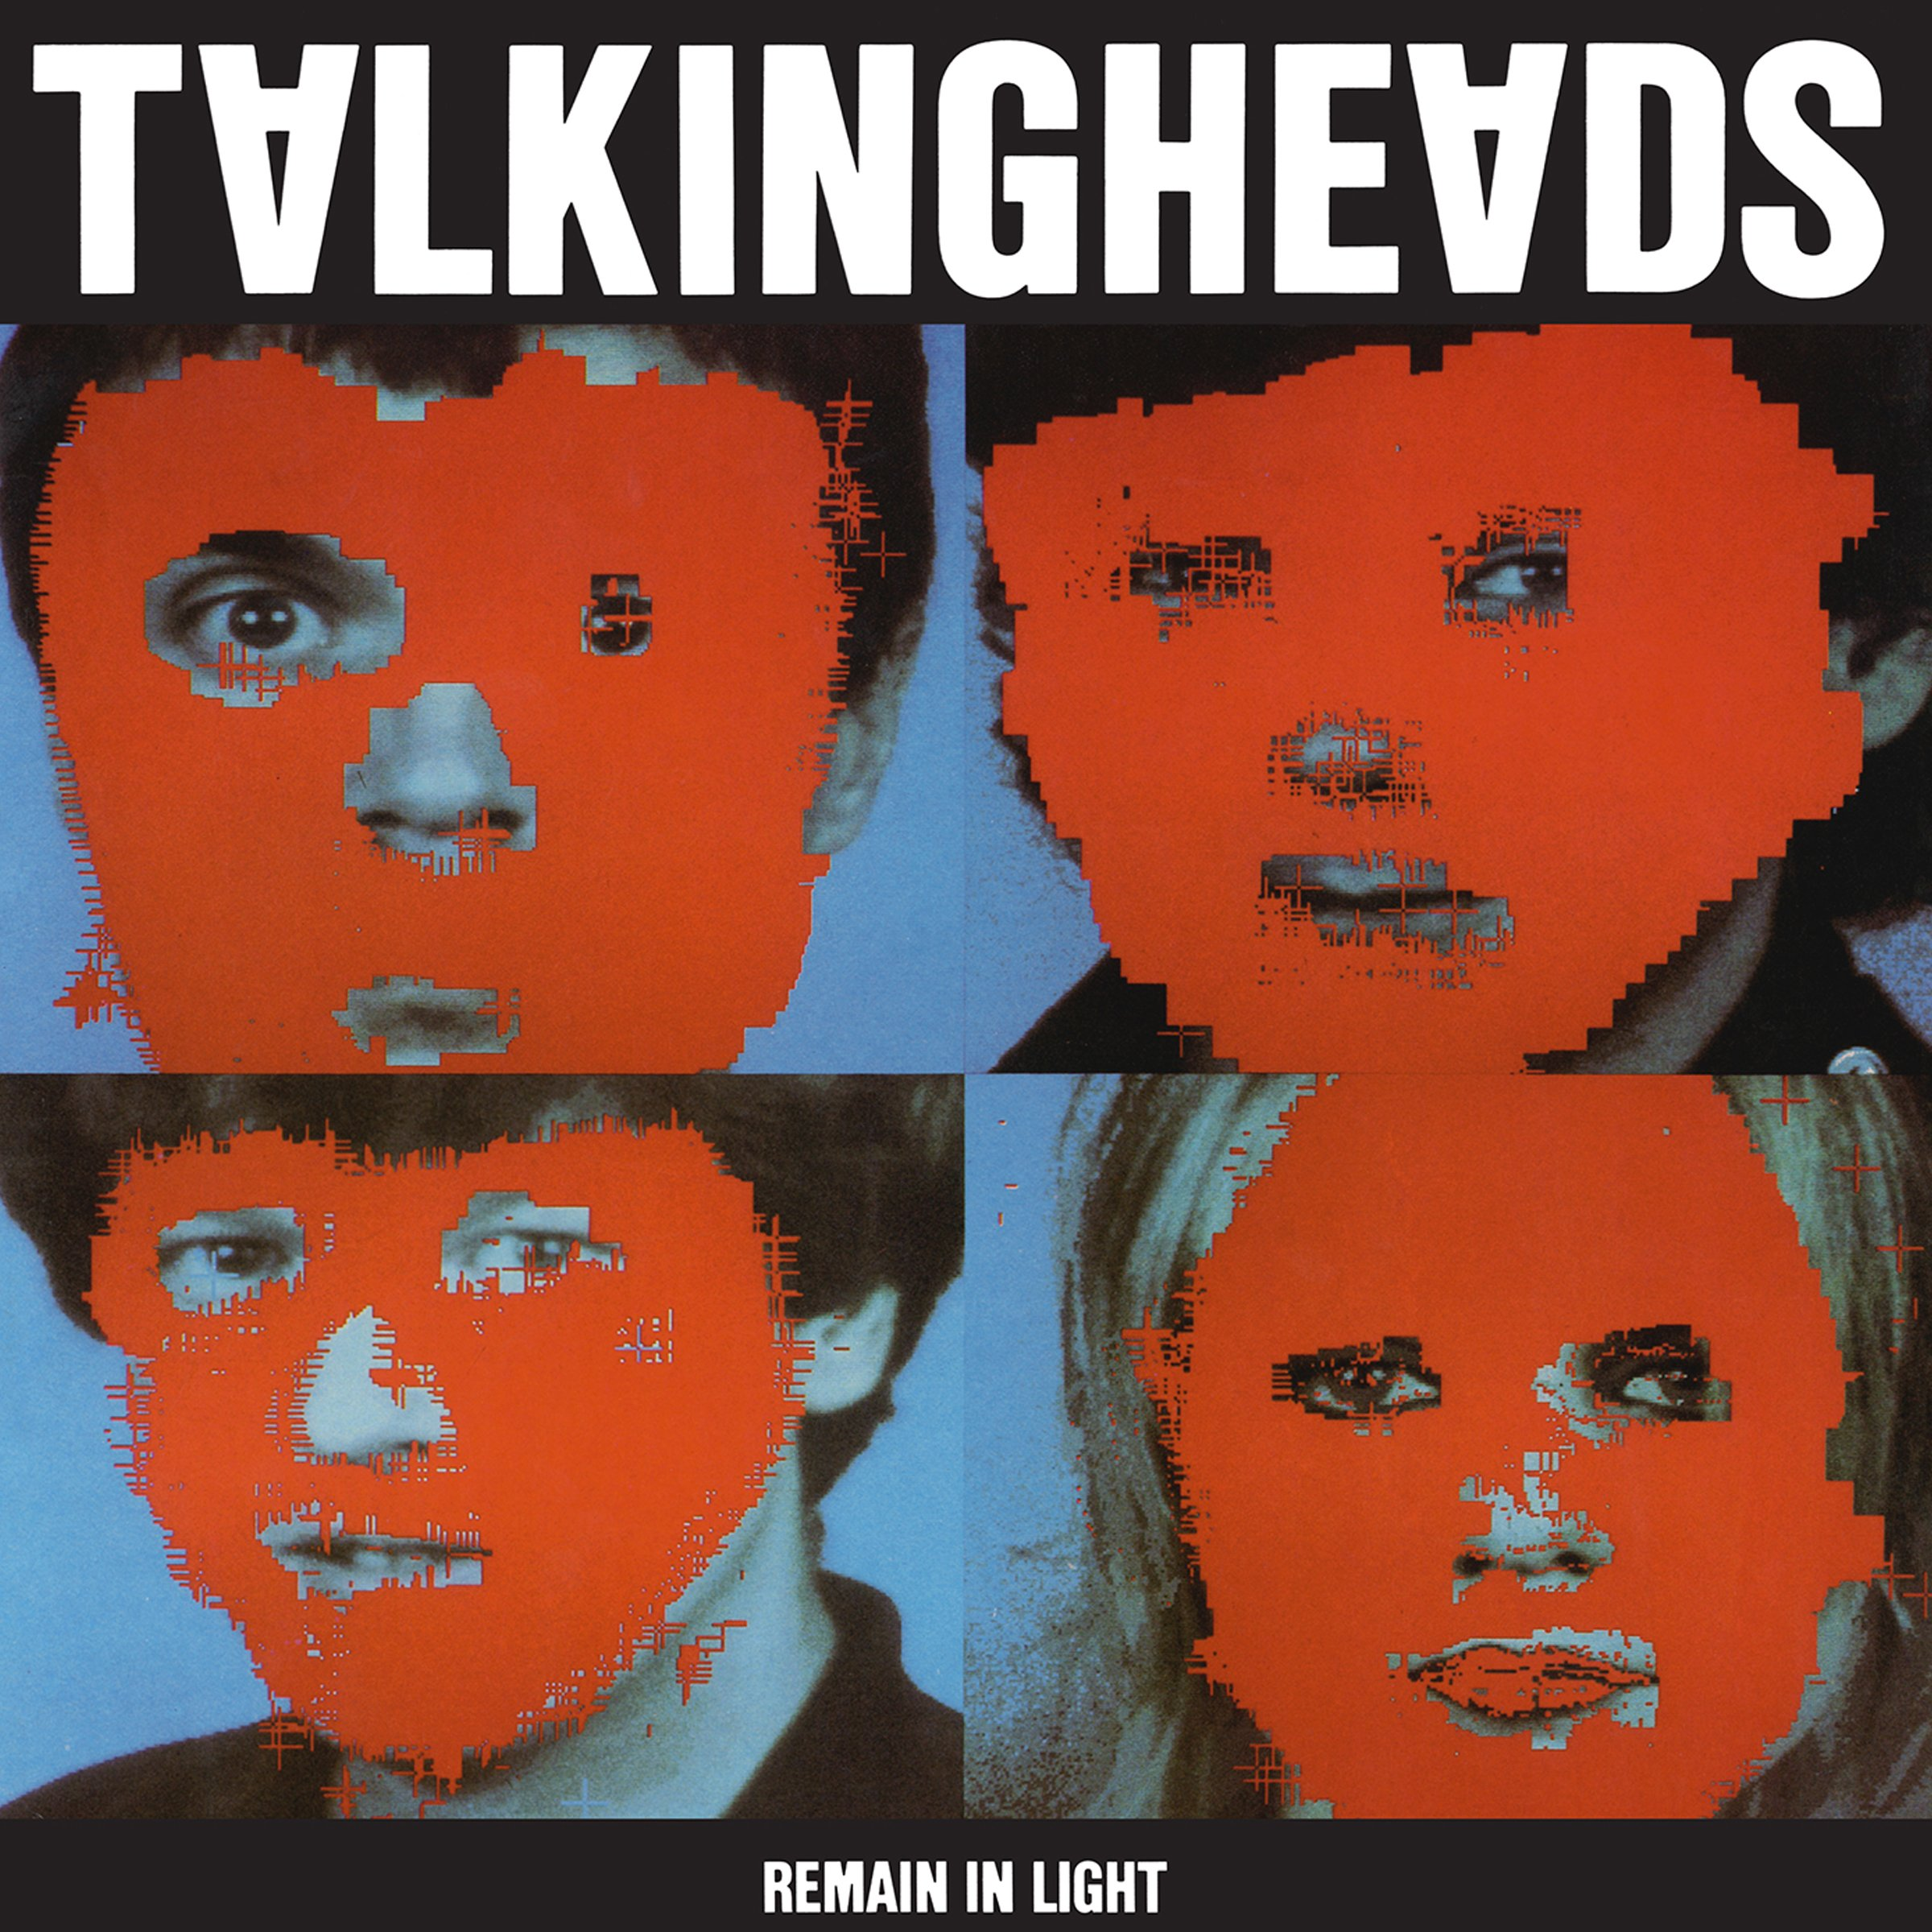 REMAIN IN LIGHT [Vinyl] by Rhino